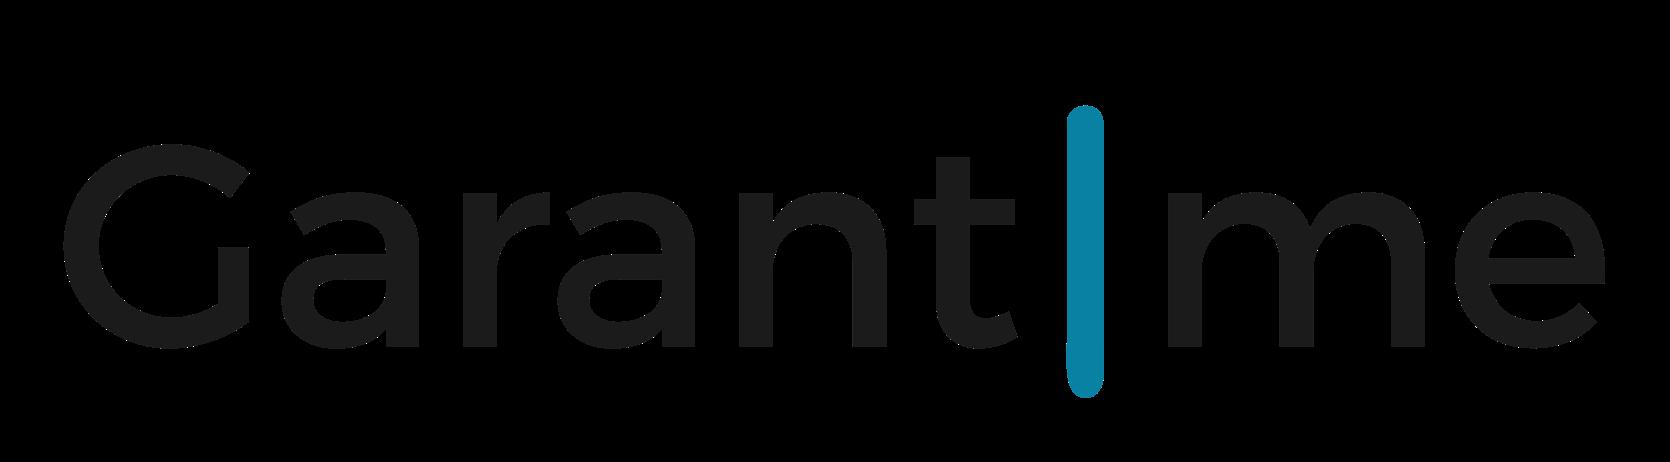 Garantme_black_logo_no_background